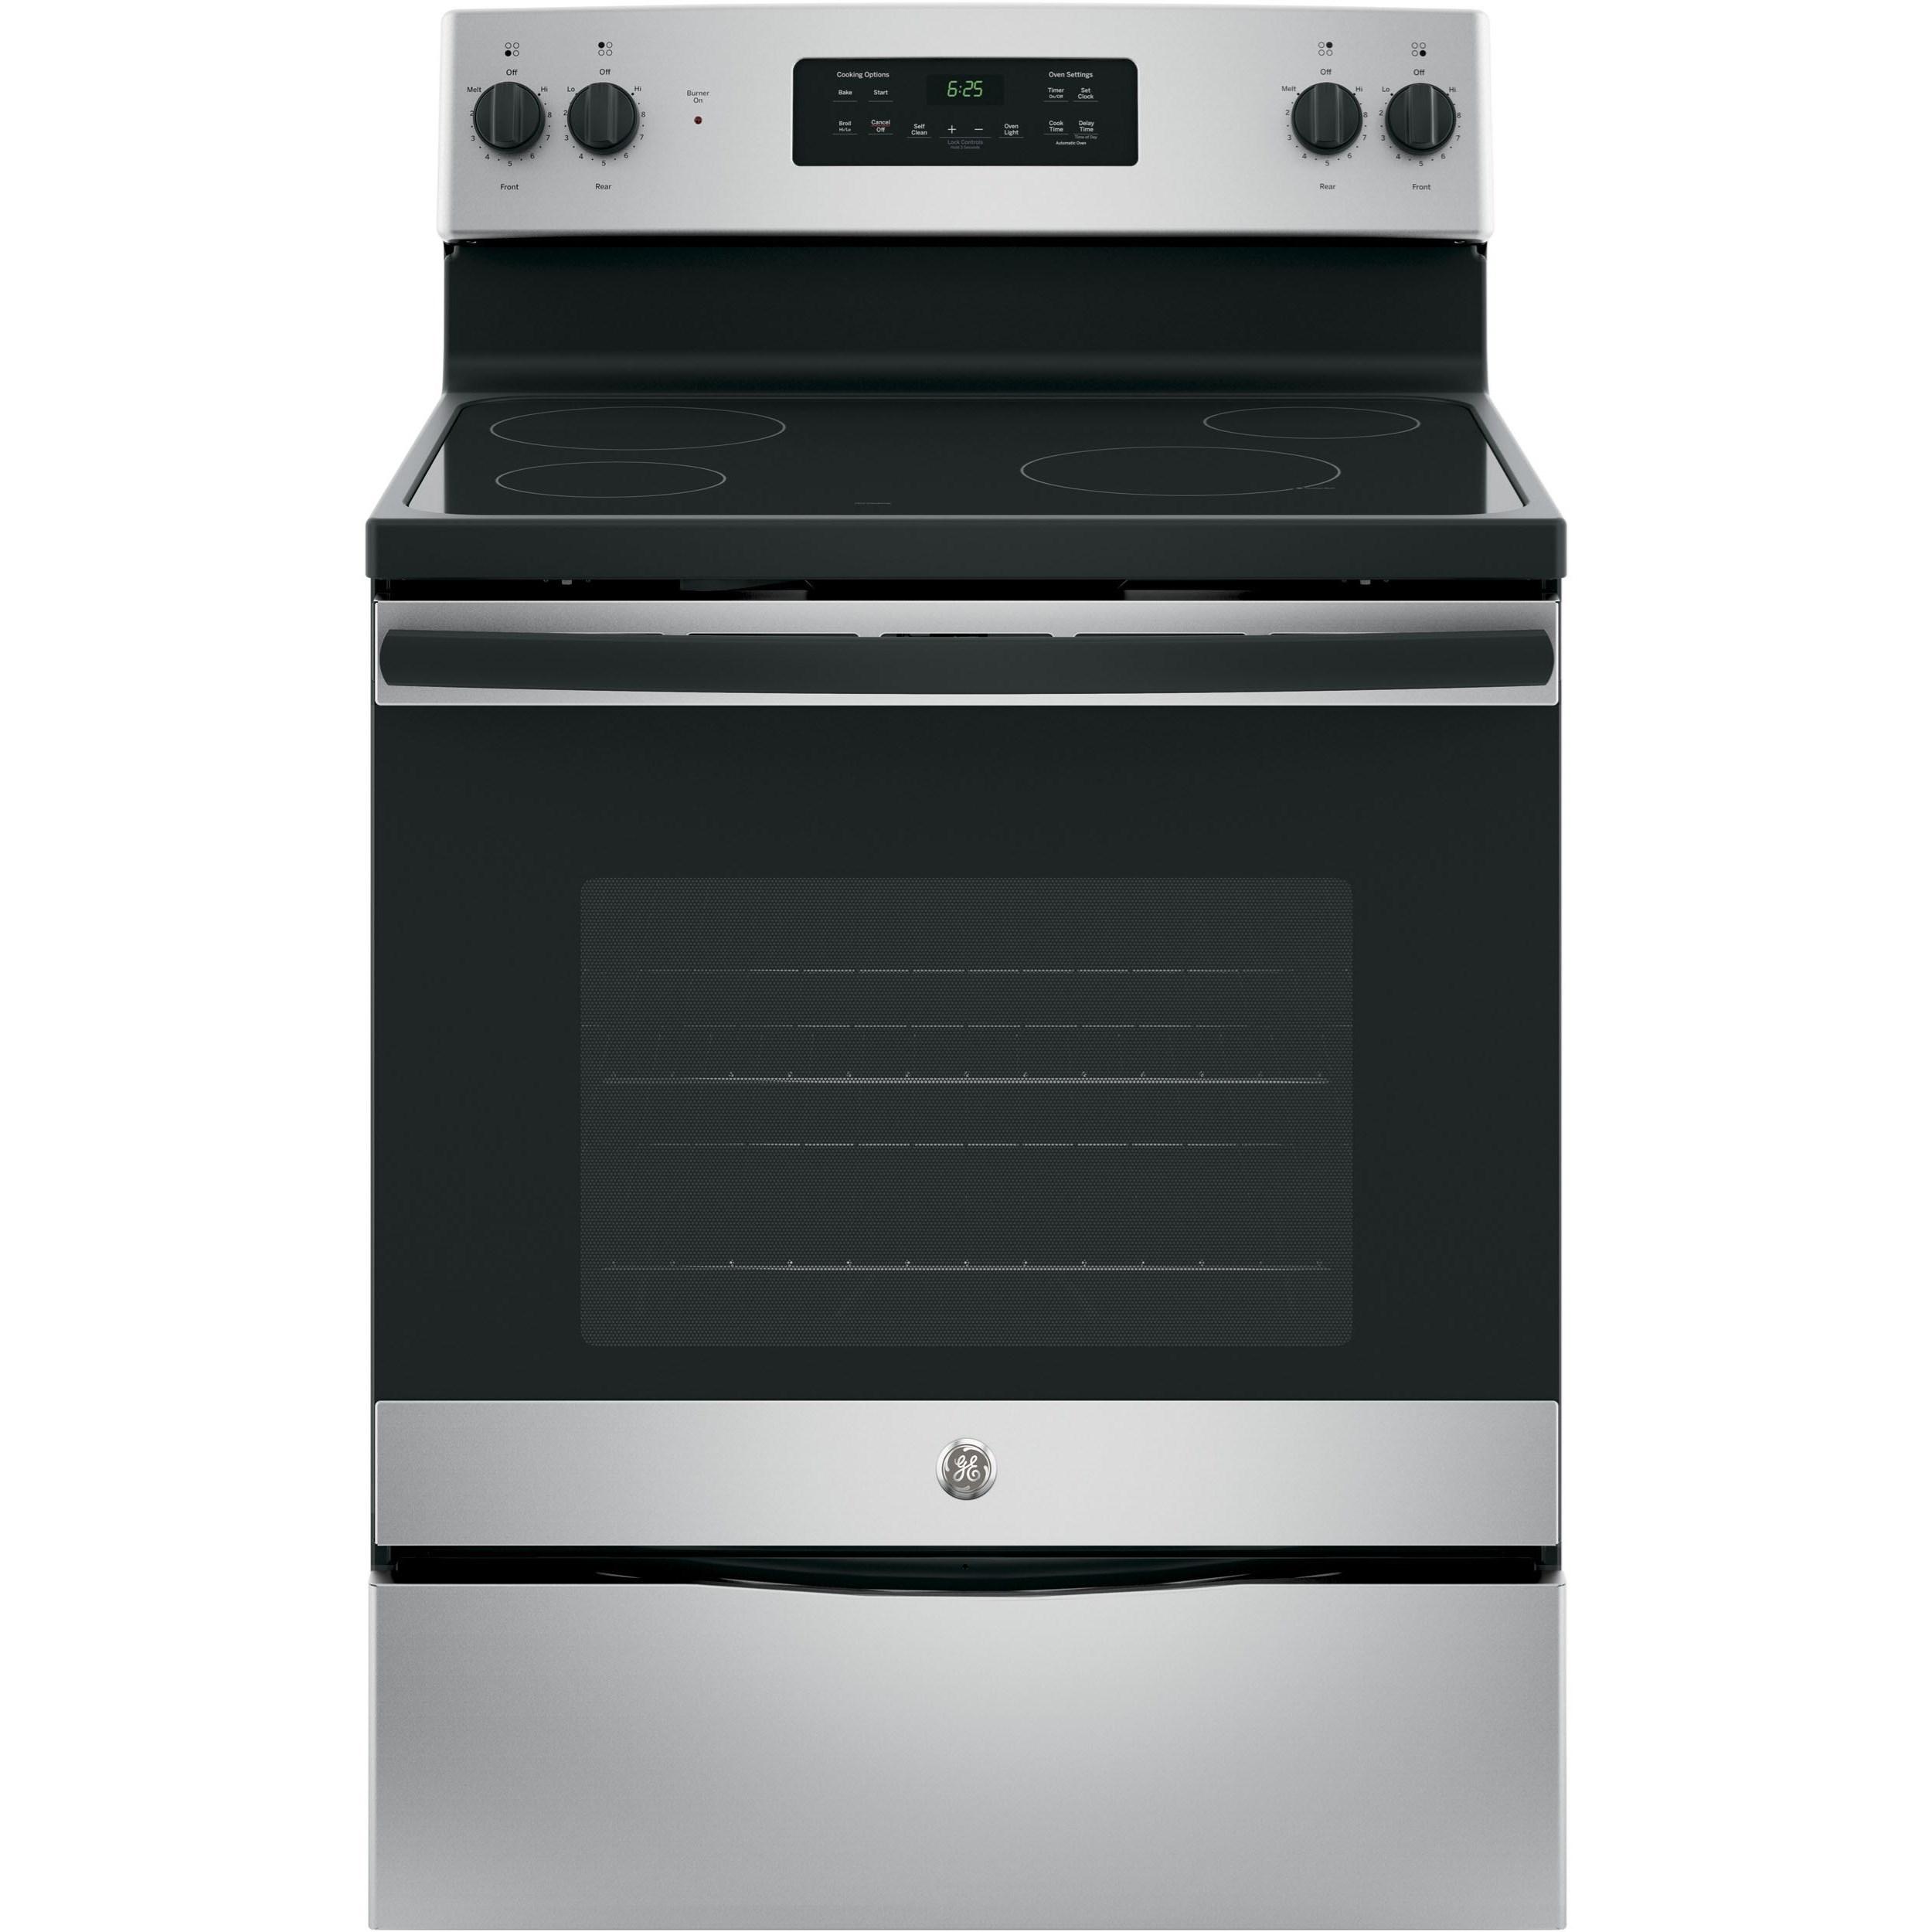 "GE Appliances GE Electric Ranges GE® 30"" Free-Standing Electric Range - Item Number: JB625GKSA"